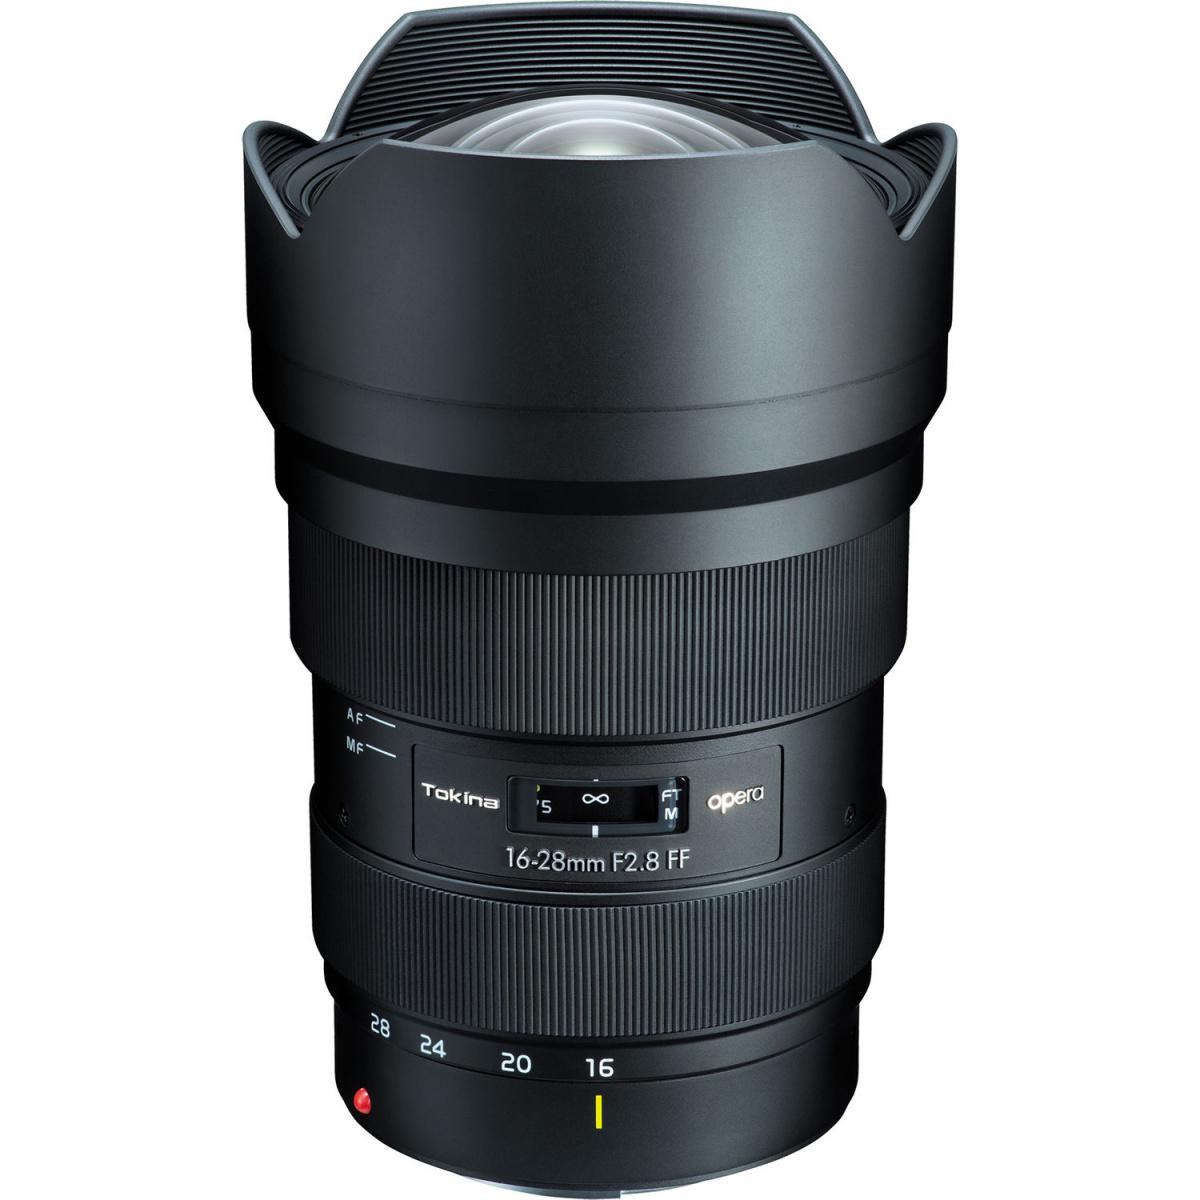 Купить - Tokina Объектив Tokina OPERA 16-28mm f/2.8 FF Lens for Canon EF